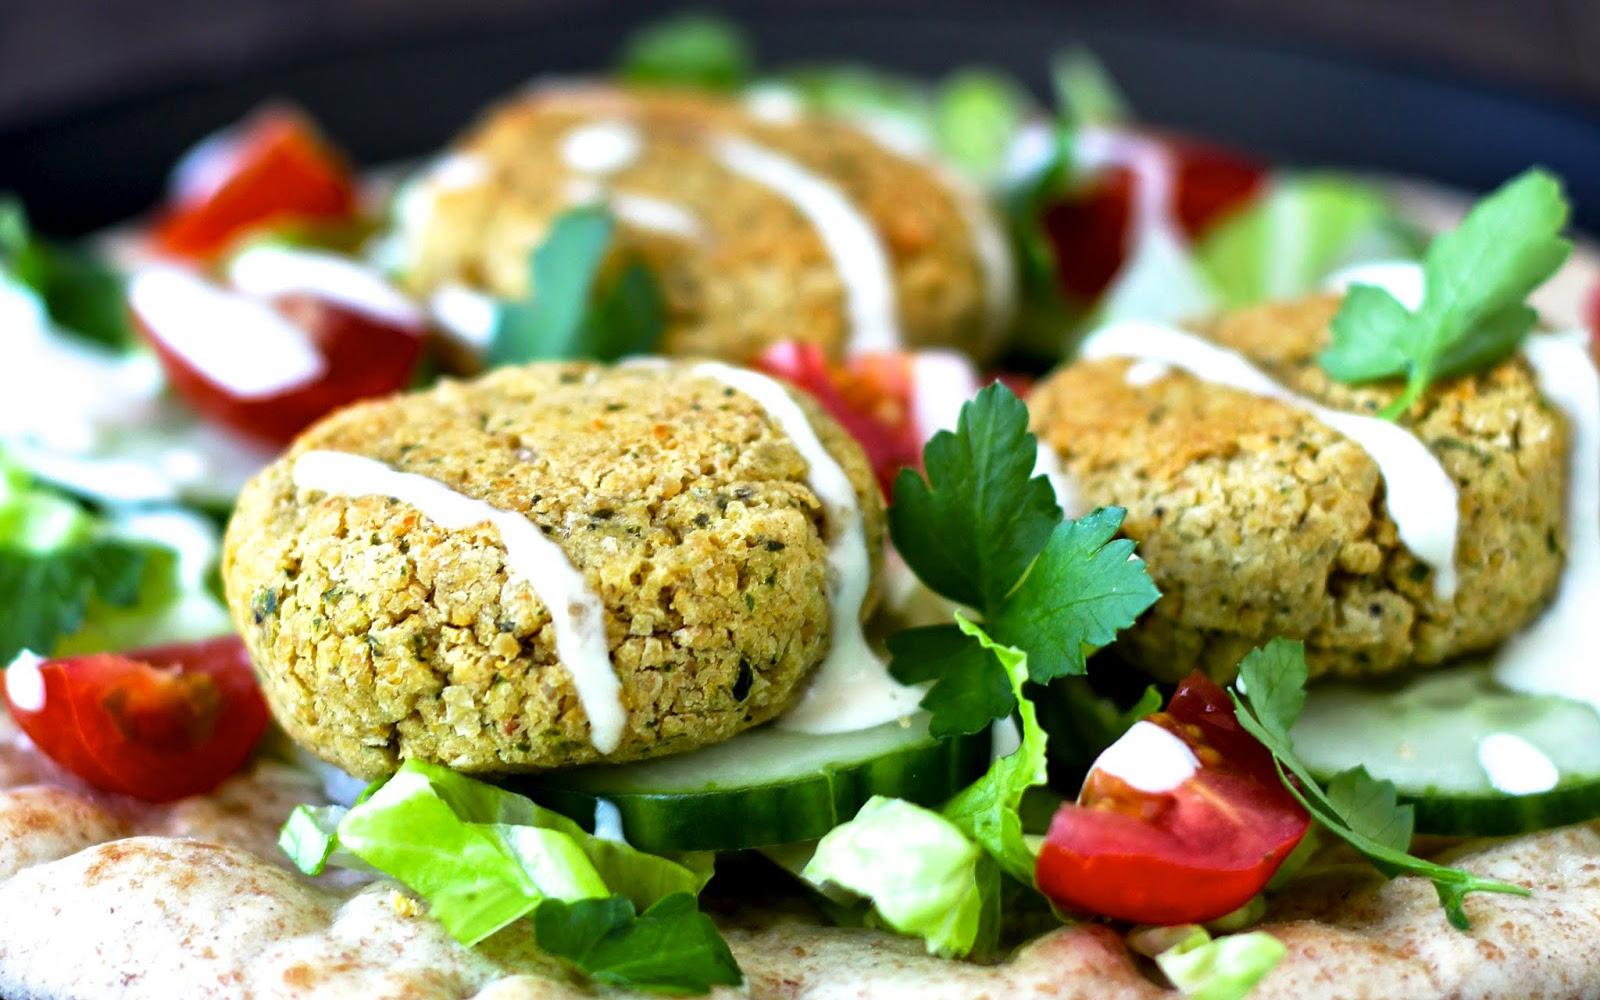 Baked Falafel With Fresh Herbs and Yogurt Tahini Sauce